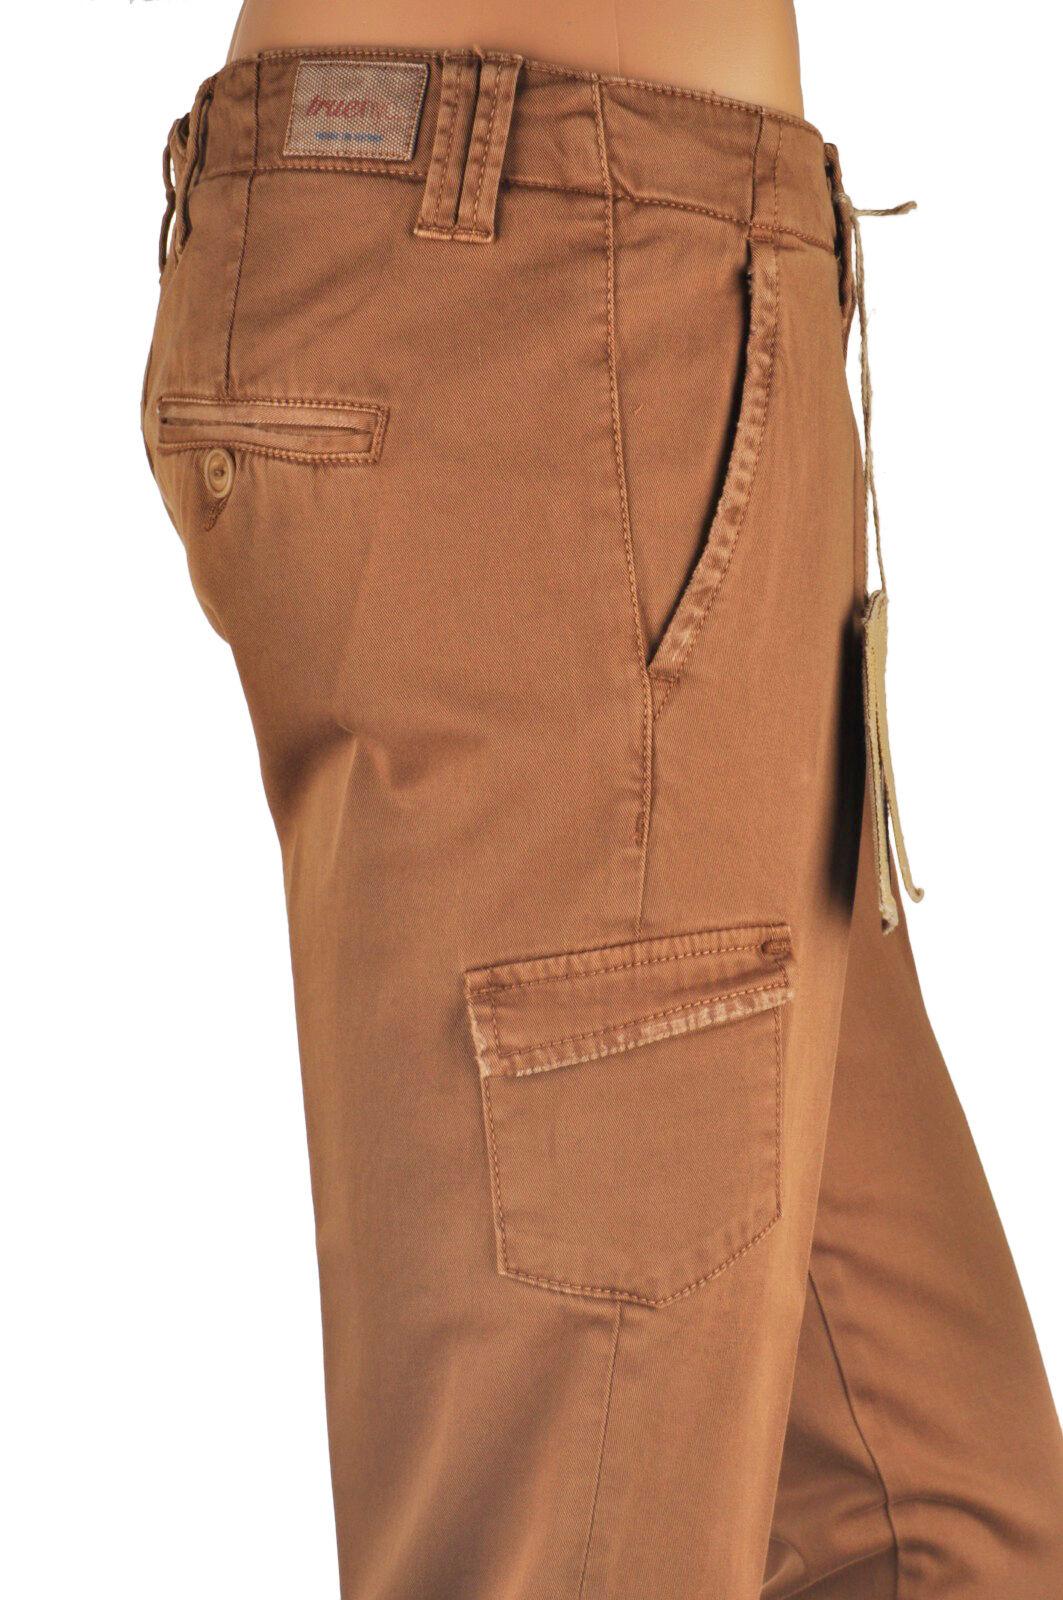 Truenyc  -  Pants - female - Brown - 181626A184324